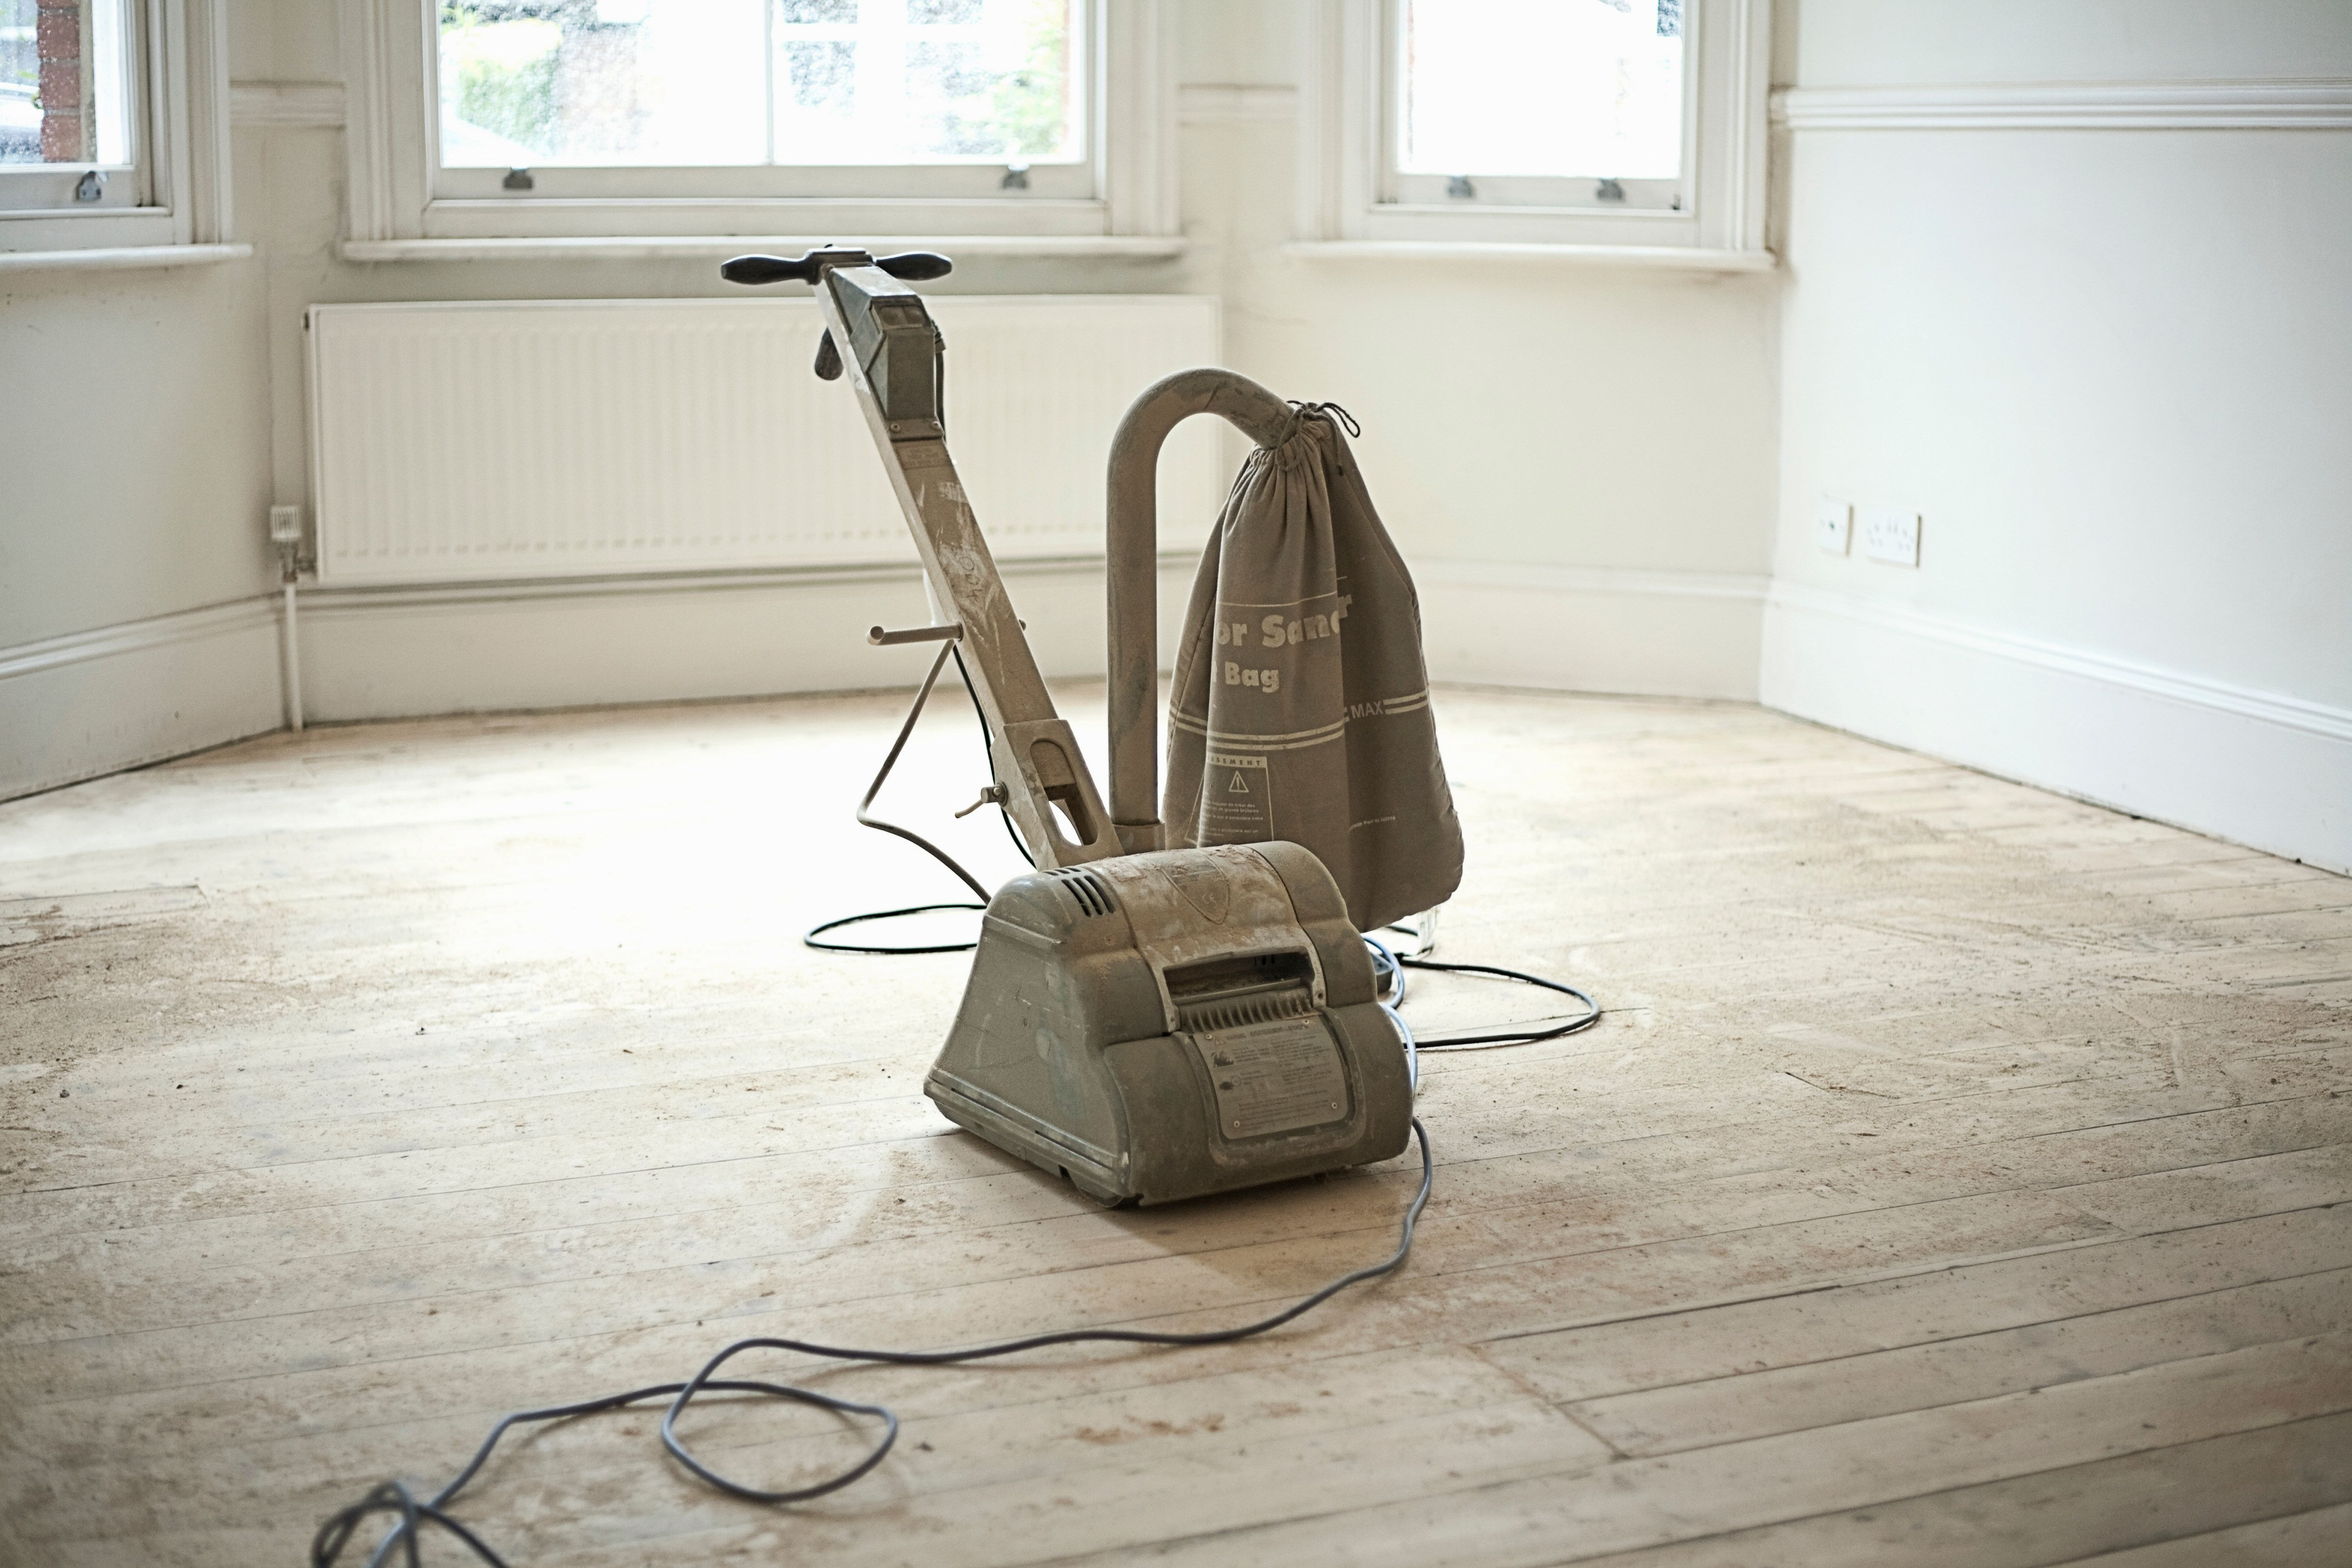 home depot hardwood floor refinishing of floor sanders to rent when finishing your wood floor within sander on wooden floorboards of new home 179707189 588760815f9b58bdb3fed440